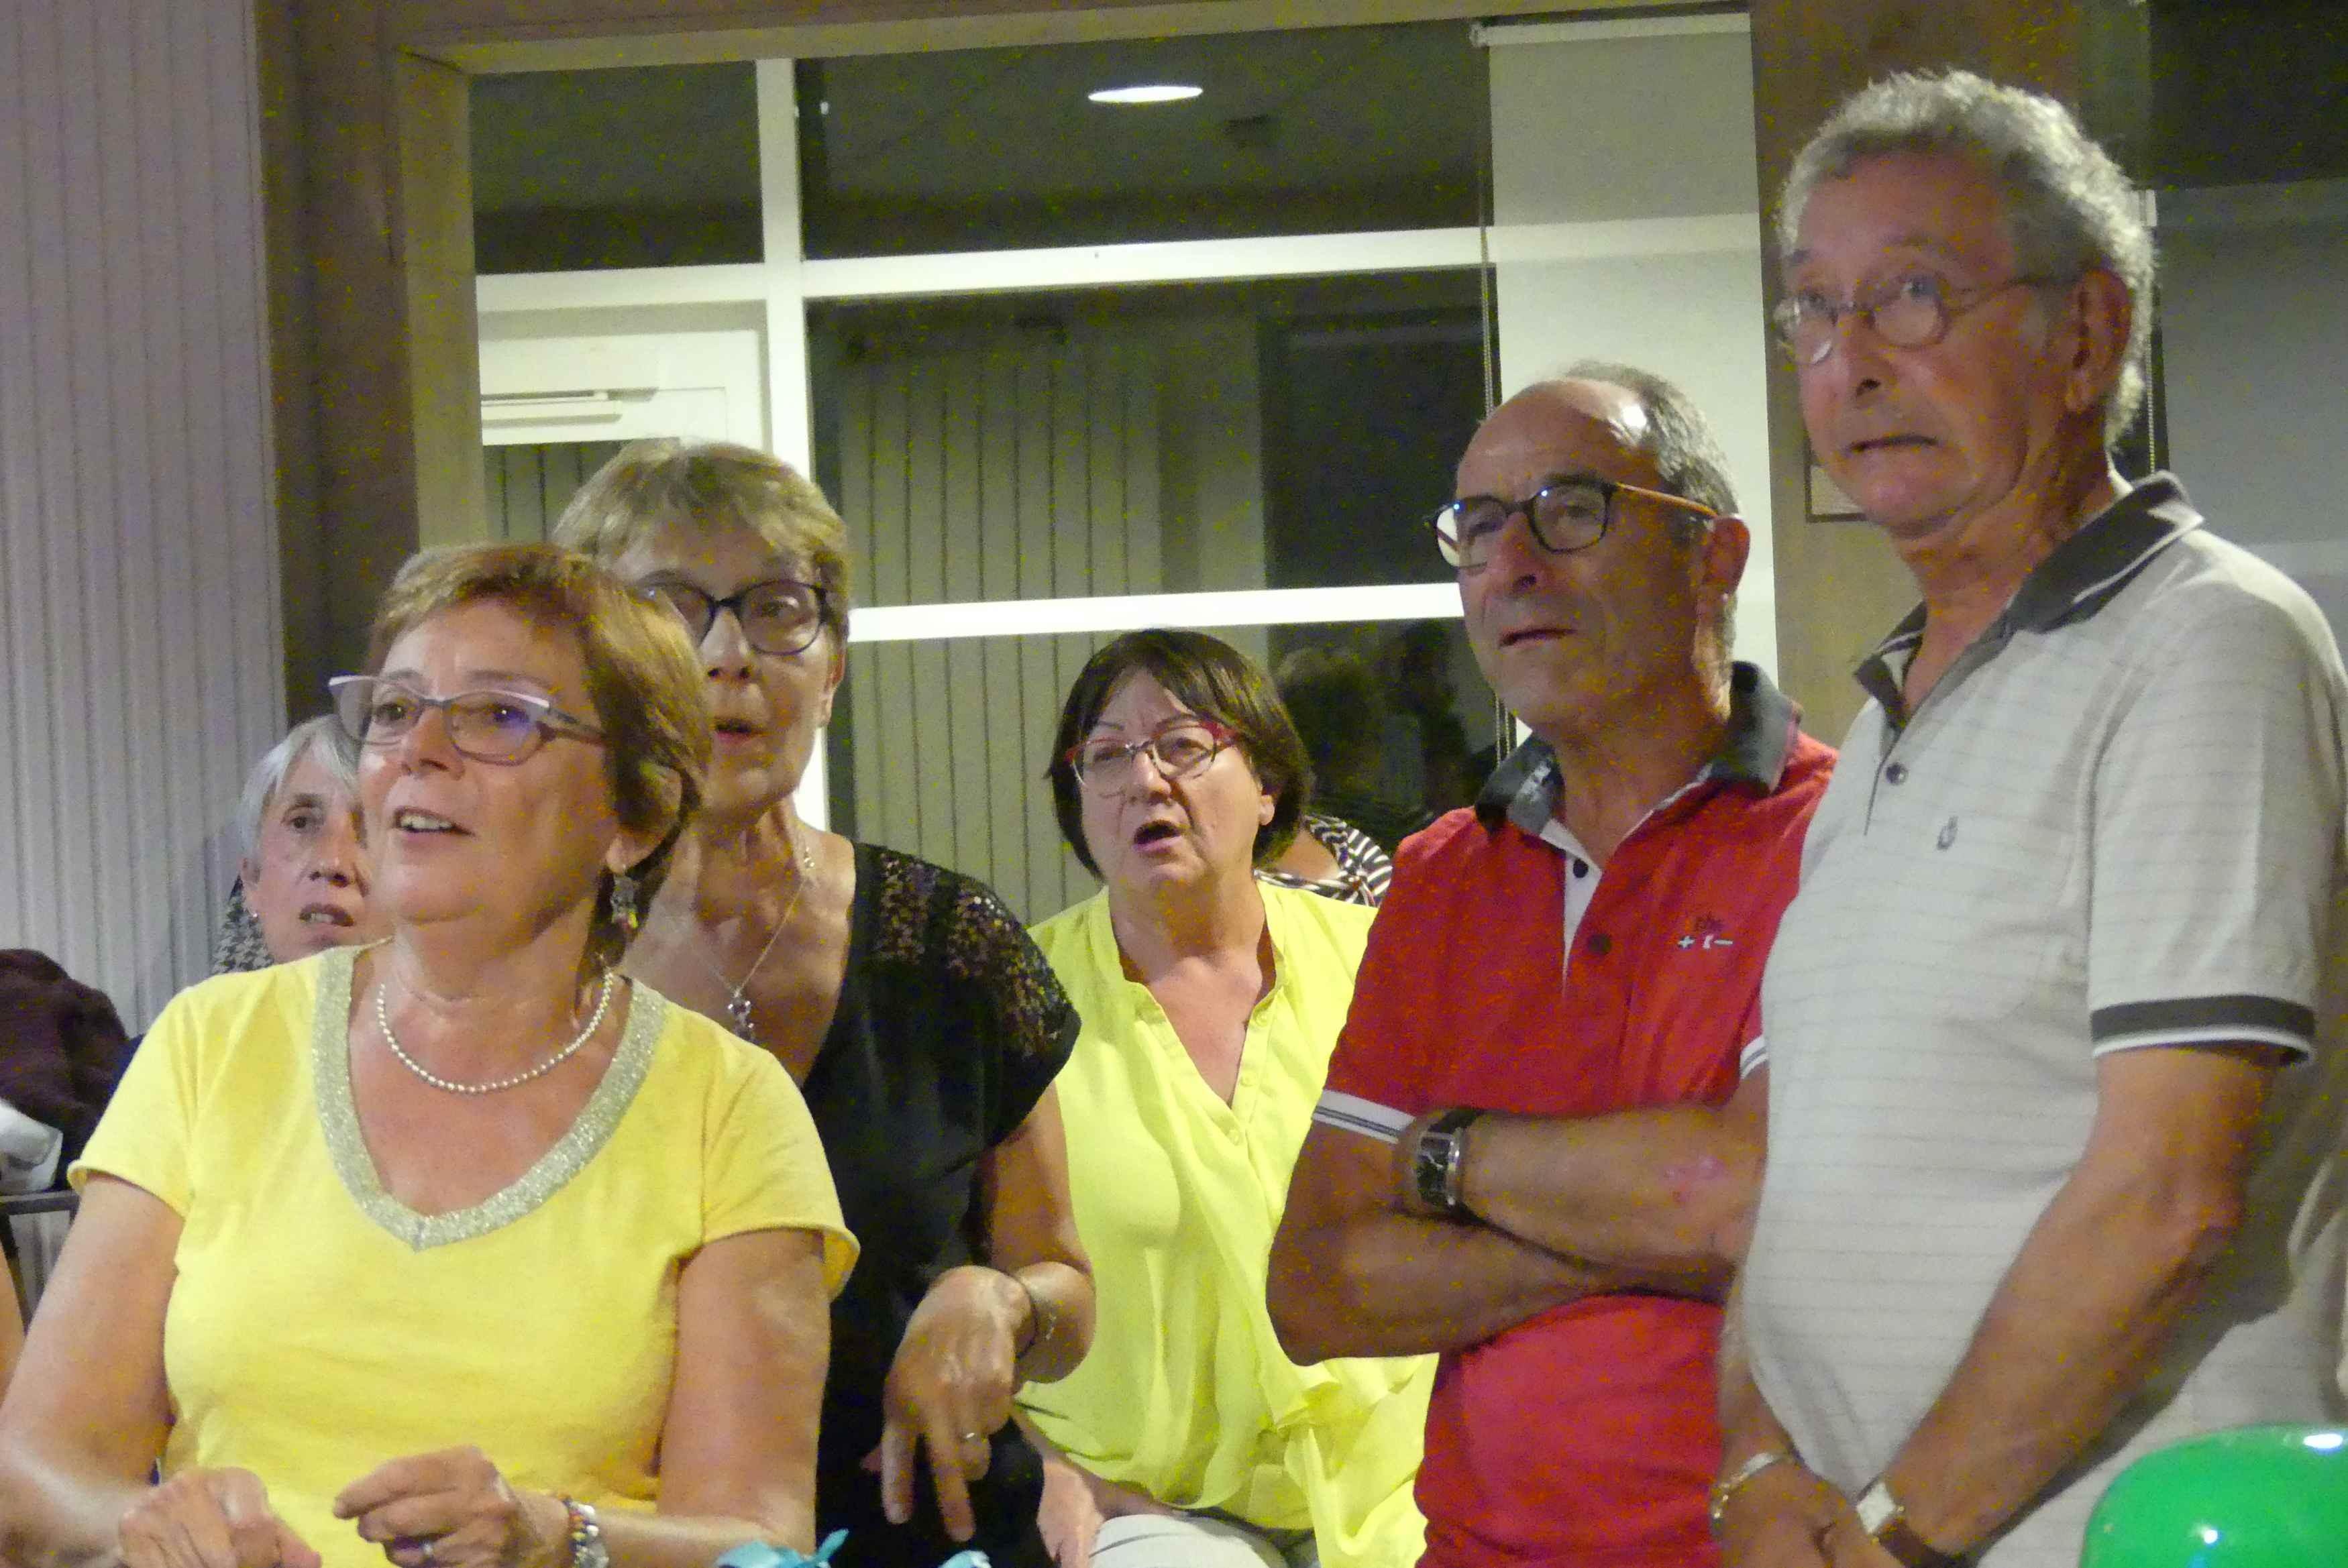 2020 09 13 0650 m soiree karaoke les tourelles normandie